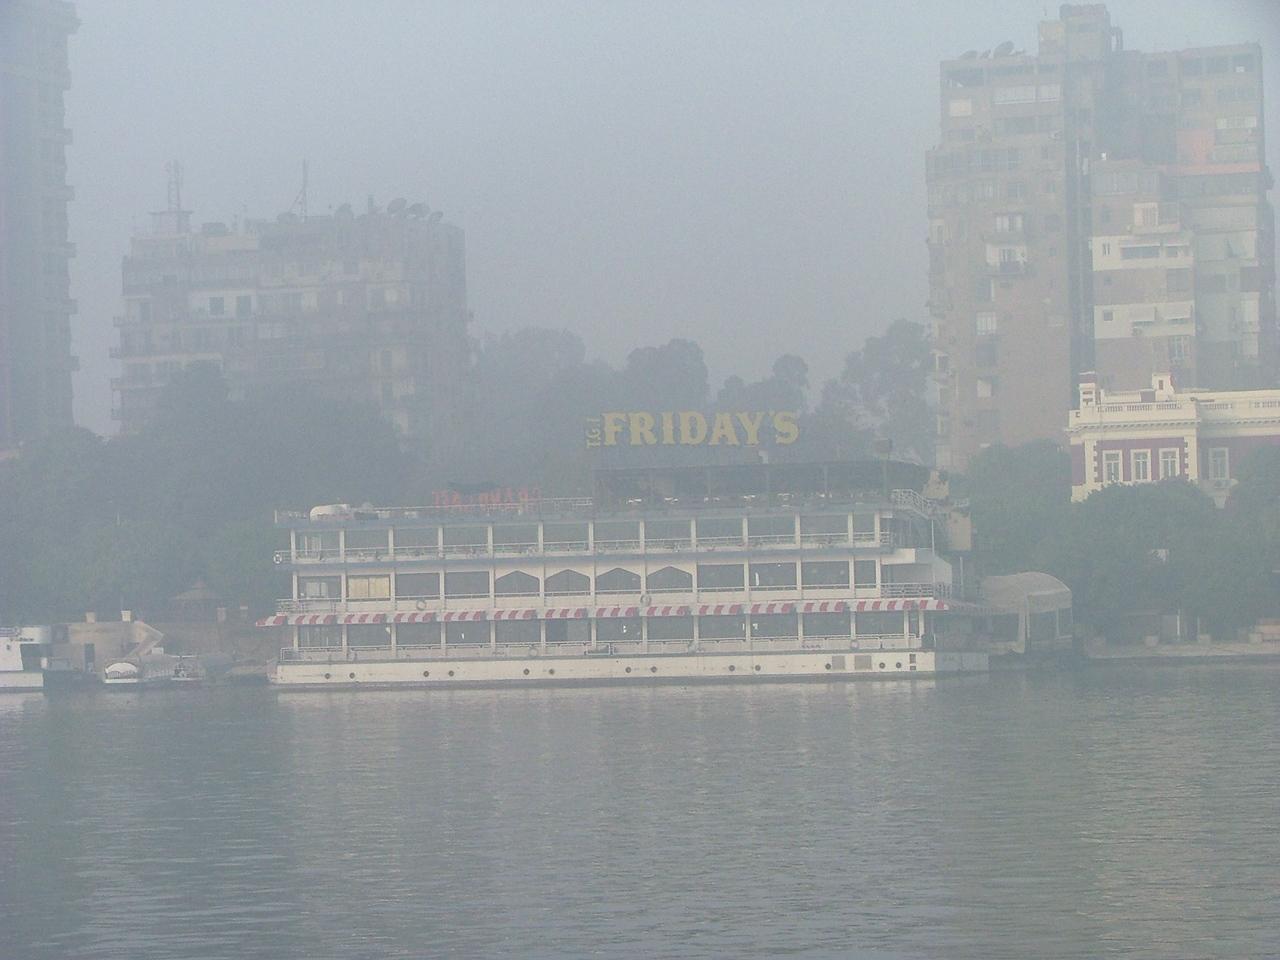 A foggy morning, but look!  TGIFridays!